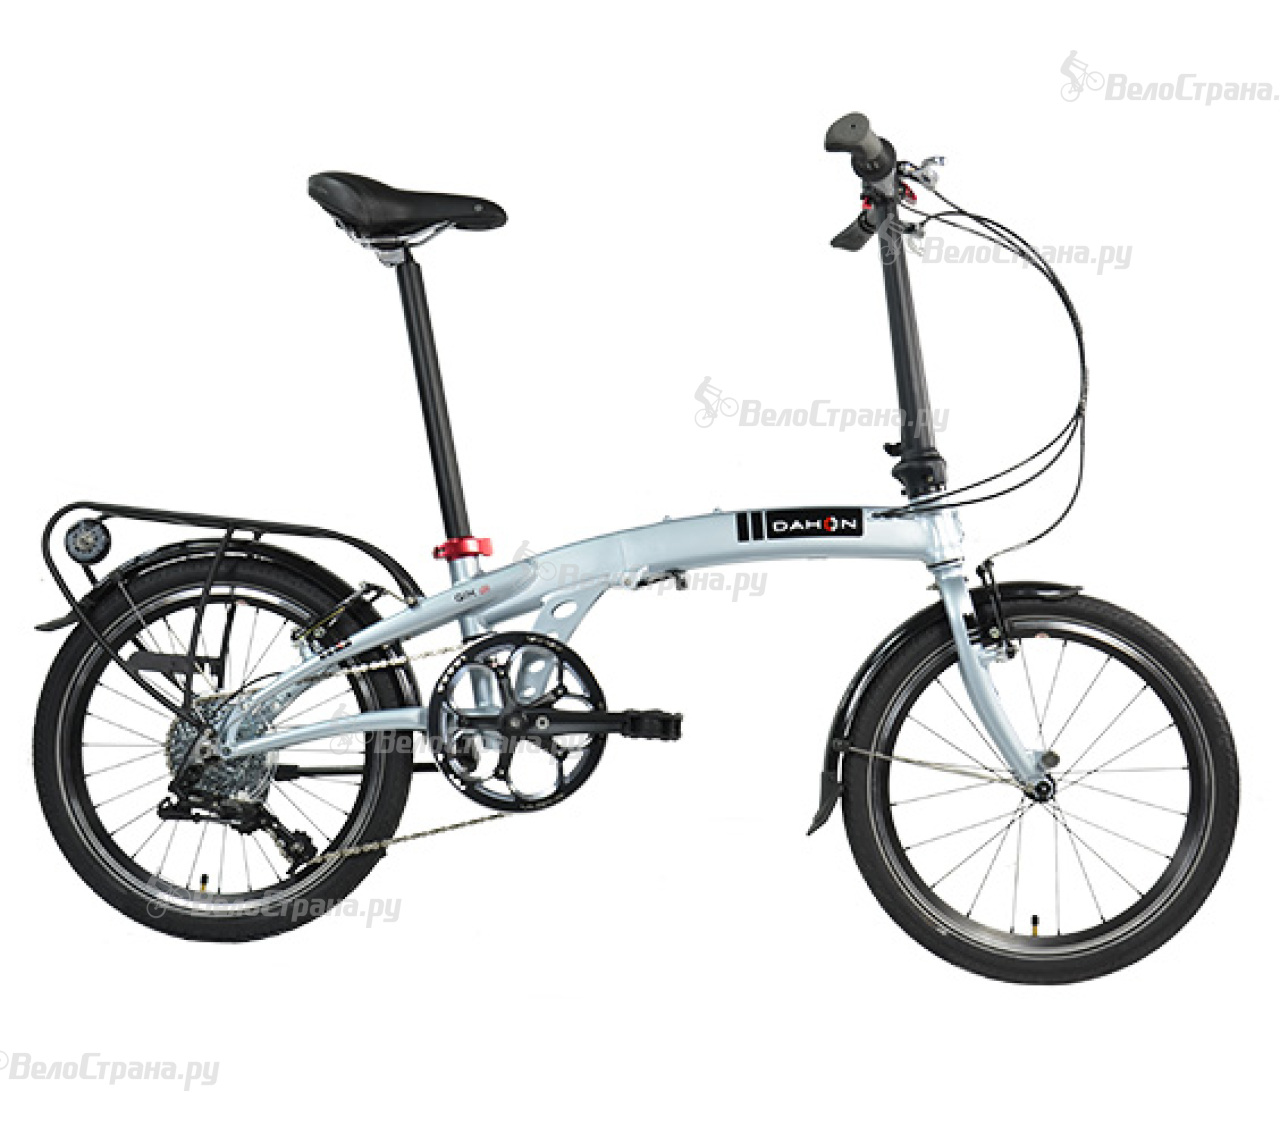 Велосипед Dahon Qix D8 (2017) велосипед dahon vybe d7 u 2017